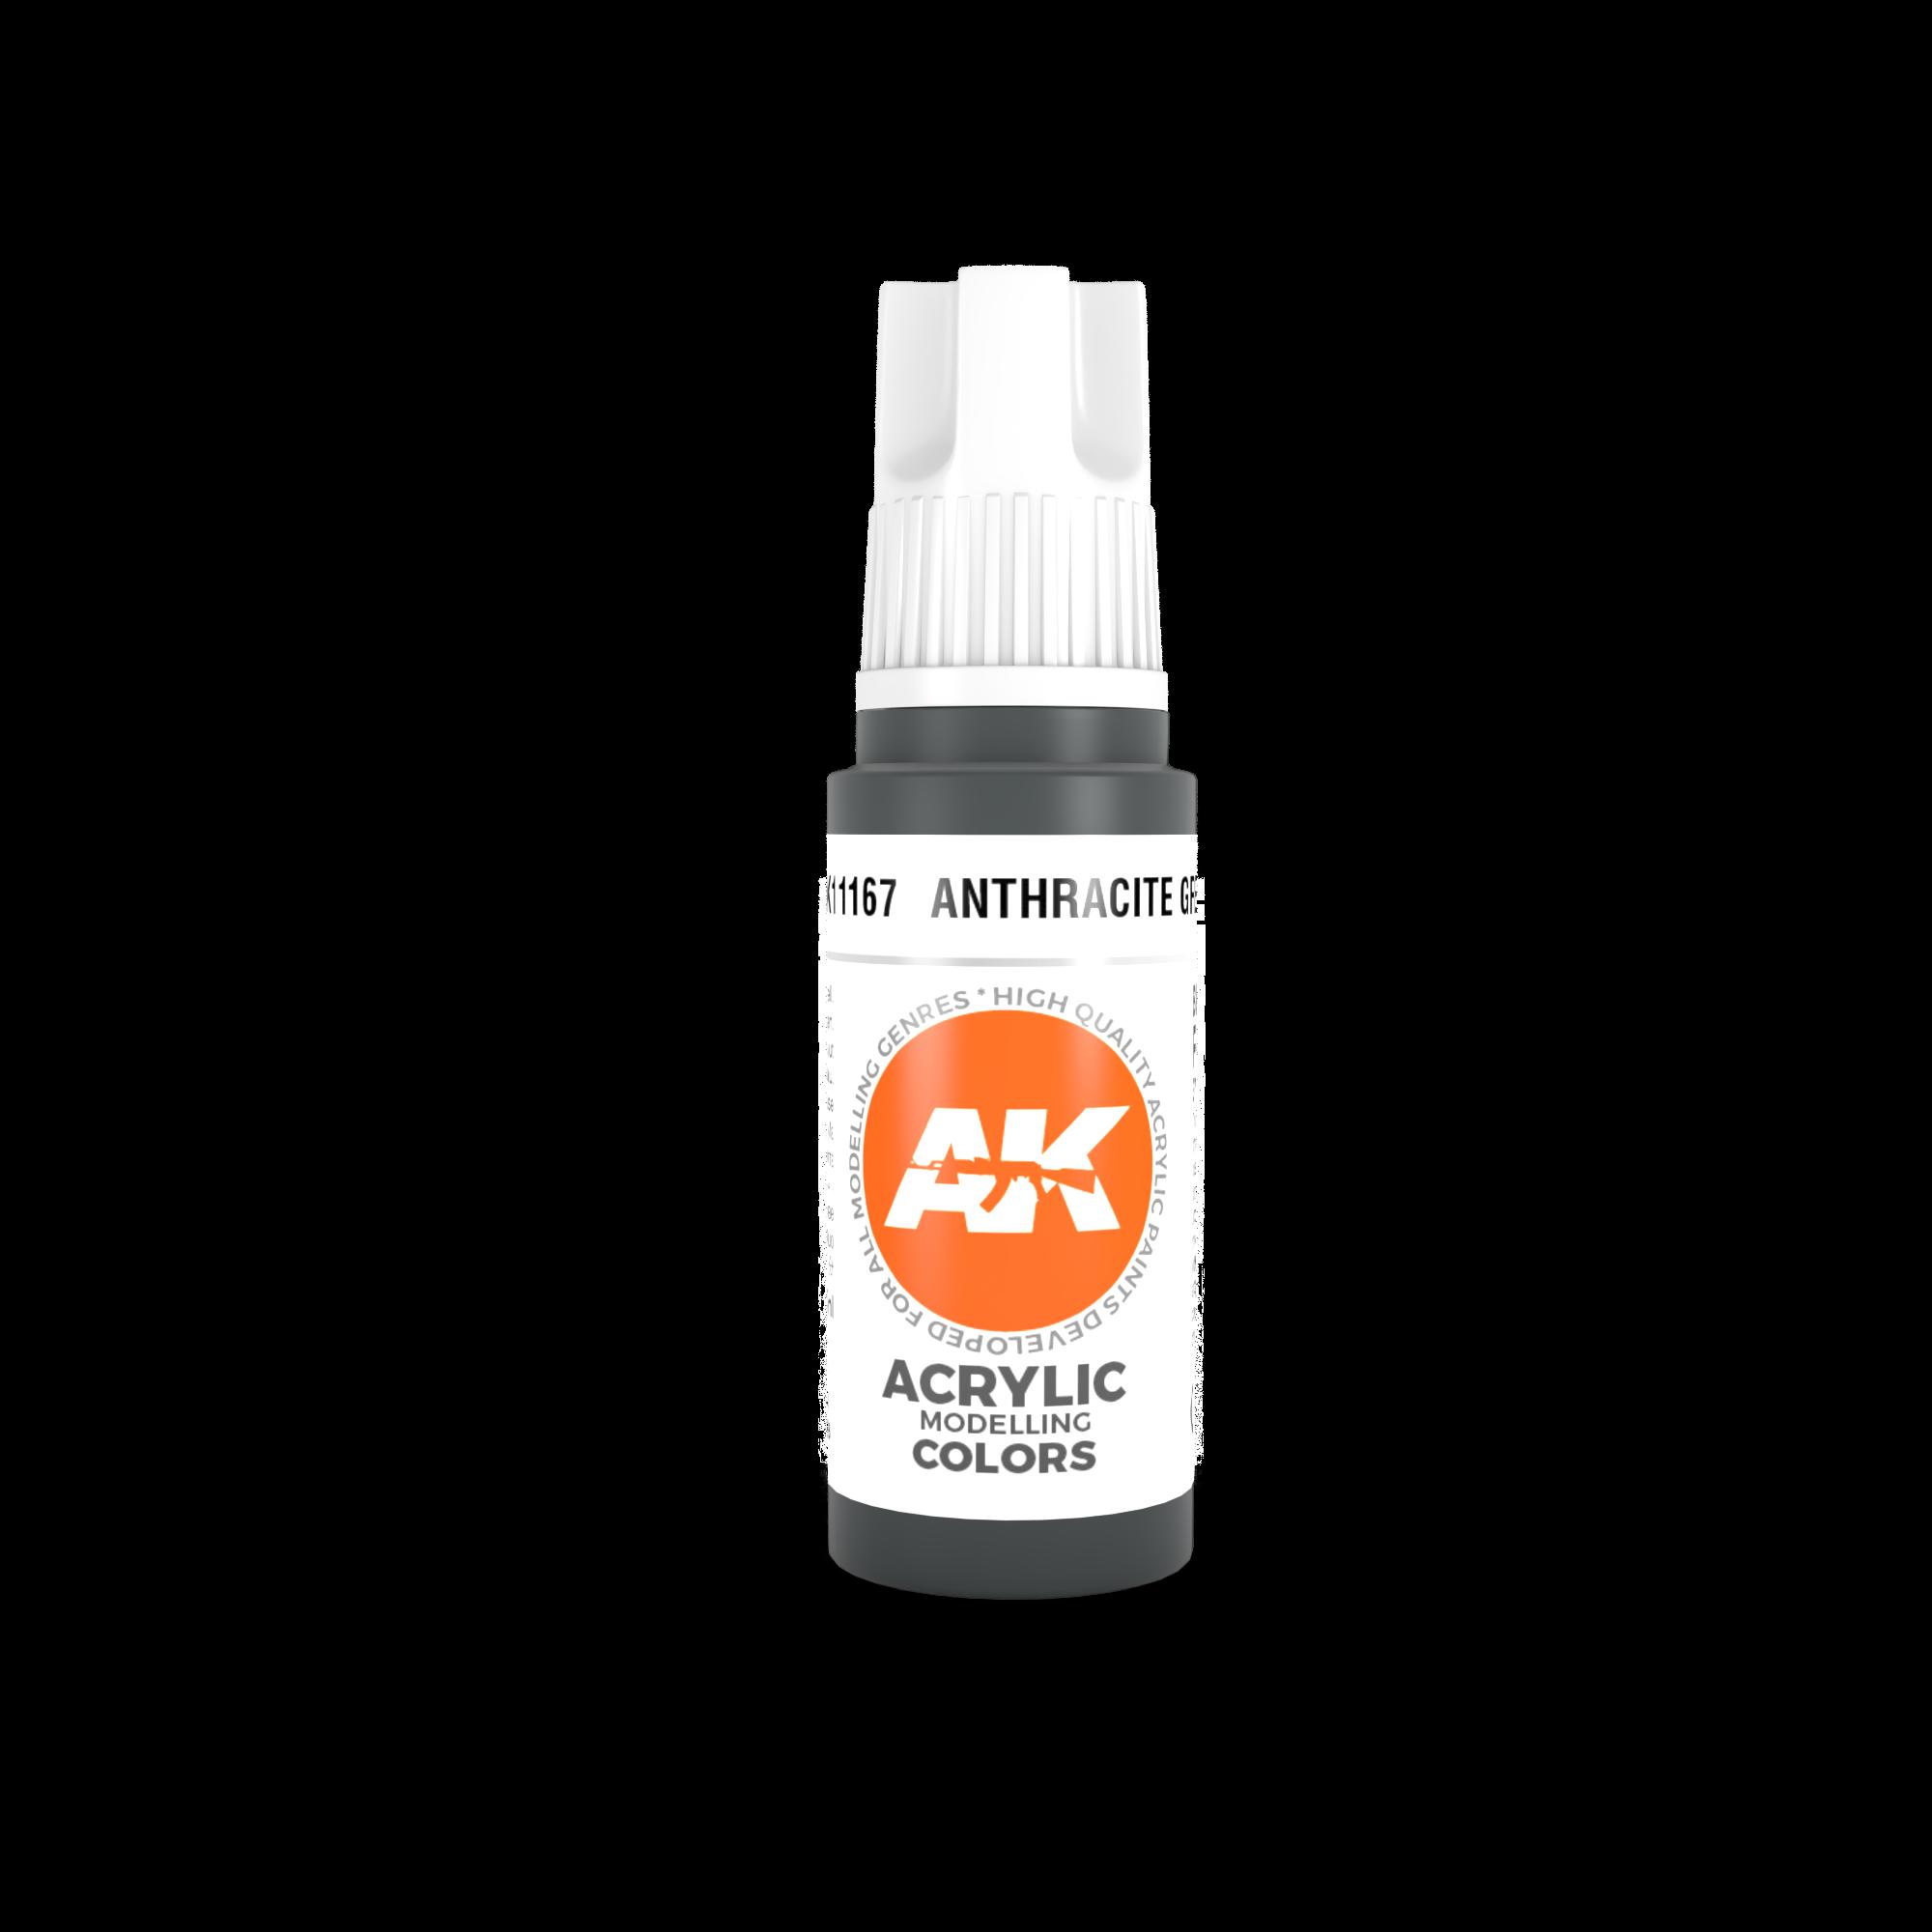 AK-Interactive Anthracite Grey Acrylic Modelling Color - 17ml - AK-11167